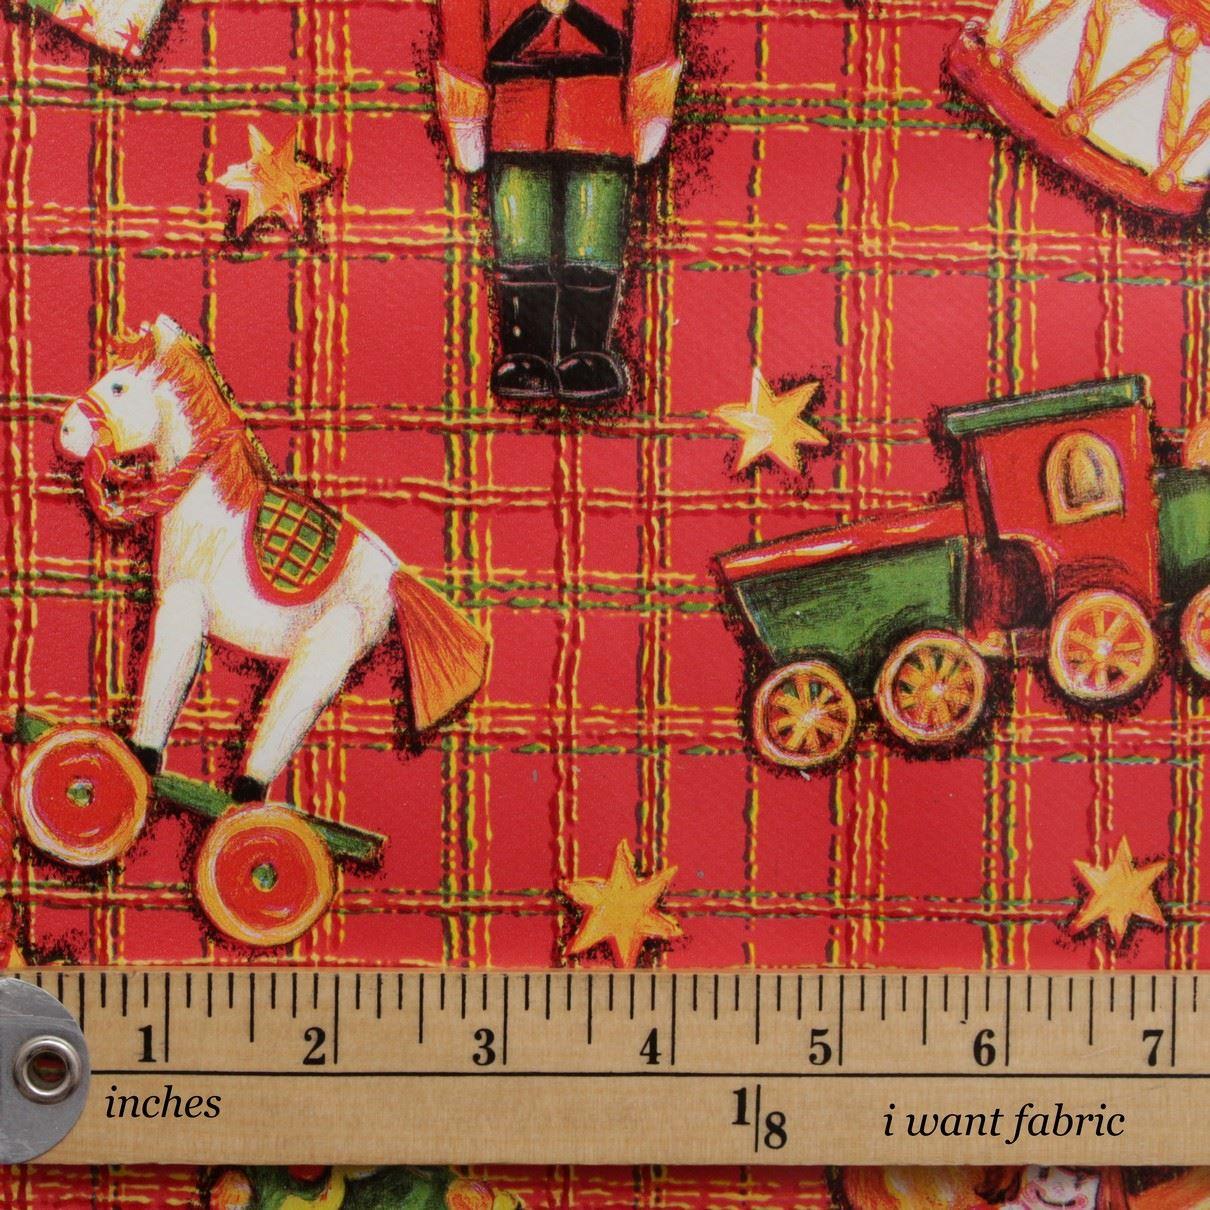 thumbnail 36 - CHRISTMAS PVC OILCLOTH VINYL FABRIC XMAS KITCHEN TABLE WIPECLEAN TABLECLOTHS